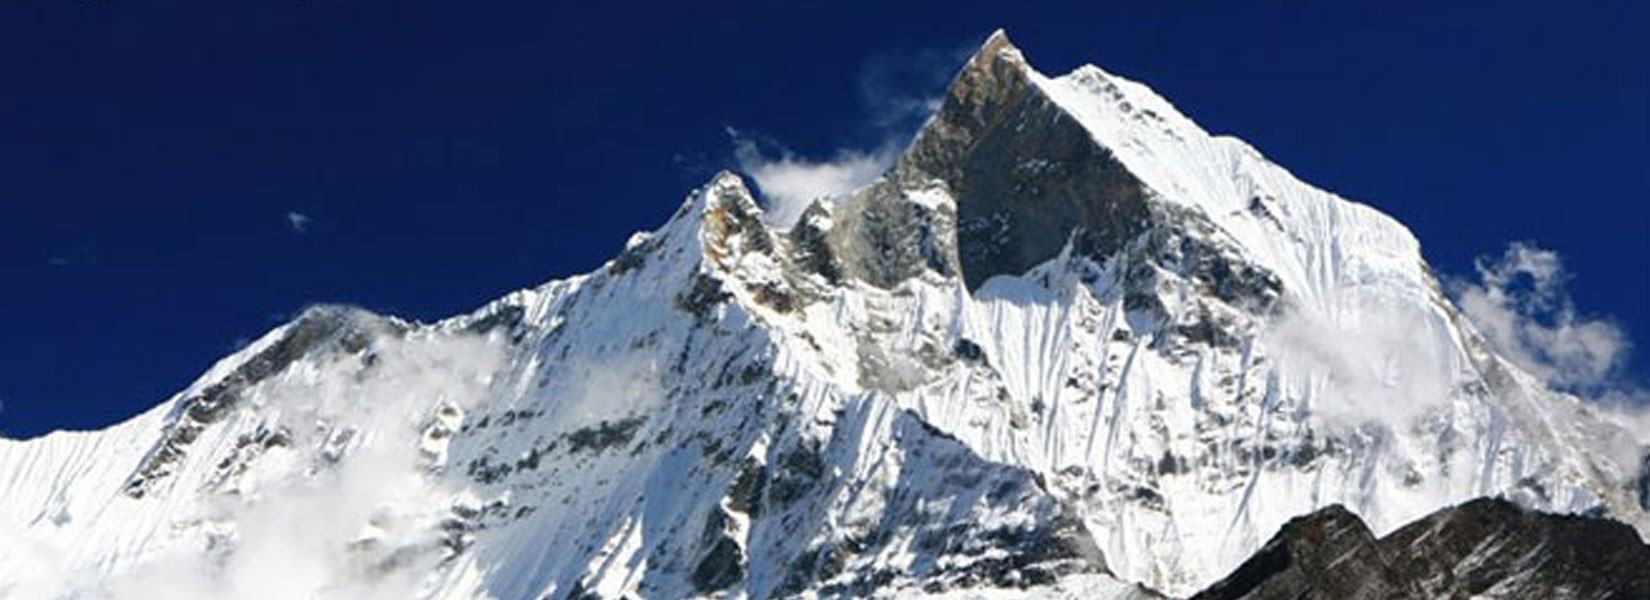 Nepal Annapurna Trekking Tours Annapurna Region Treks